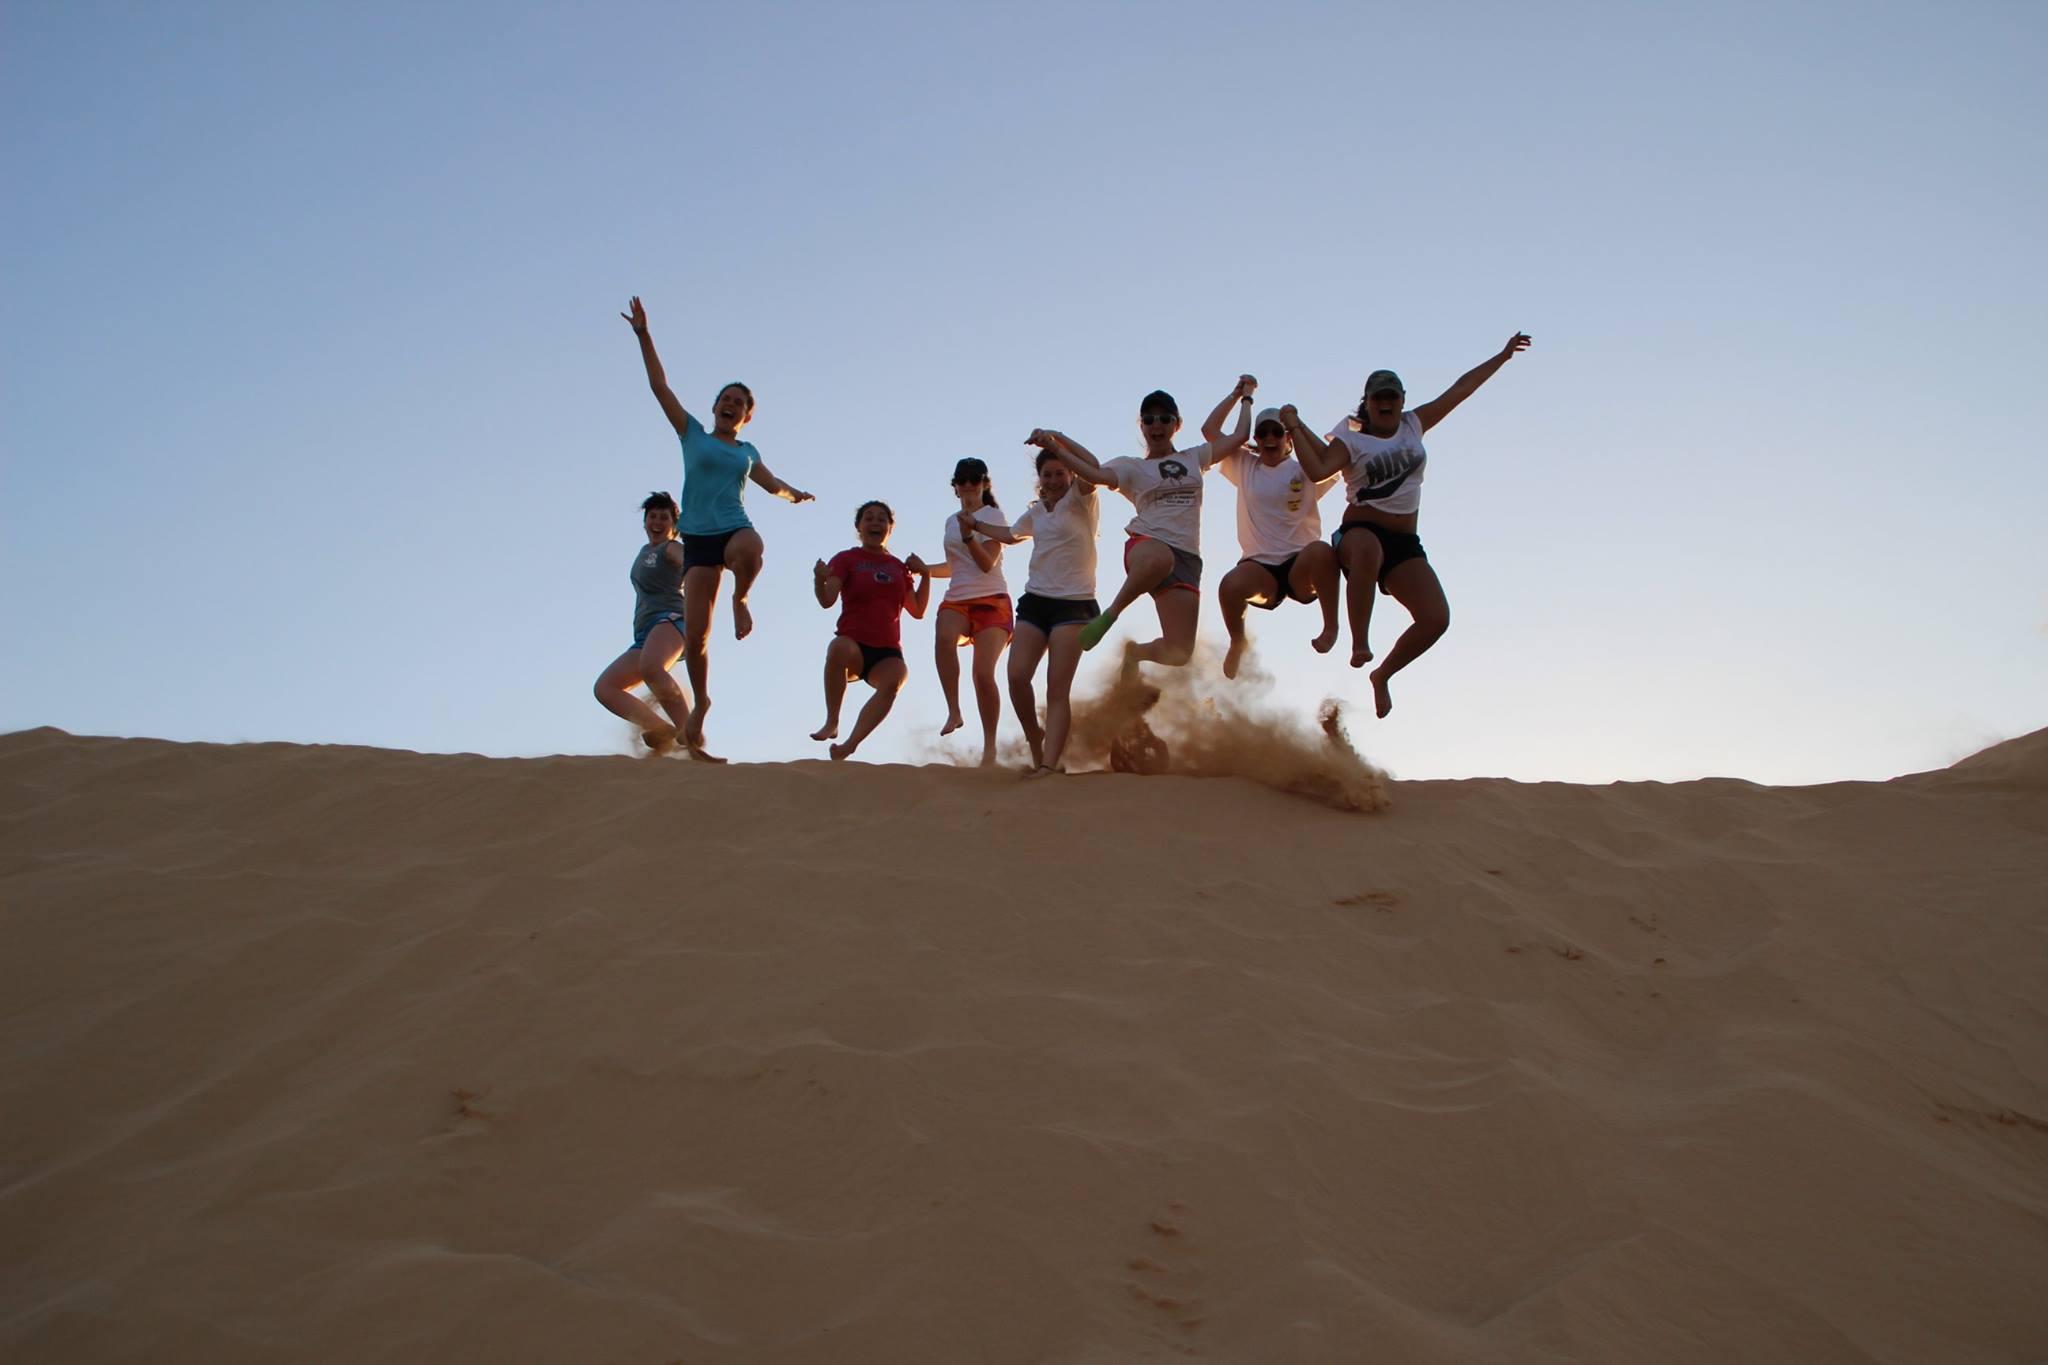 Young Judaea Summer Programs in Israel